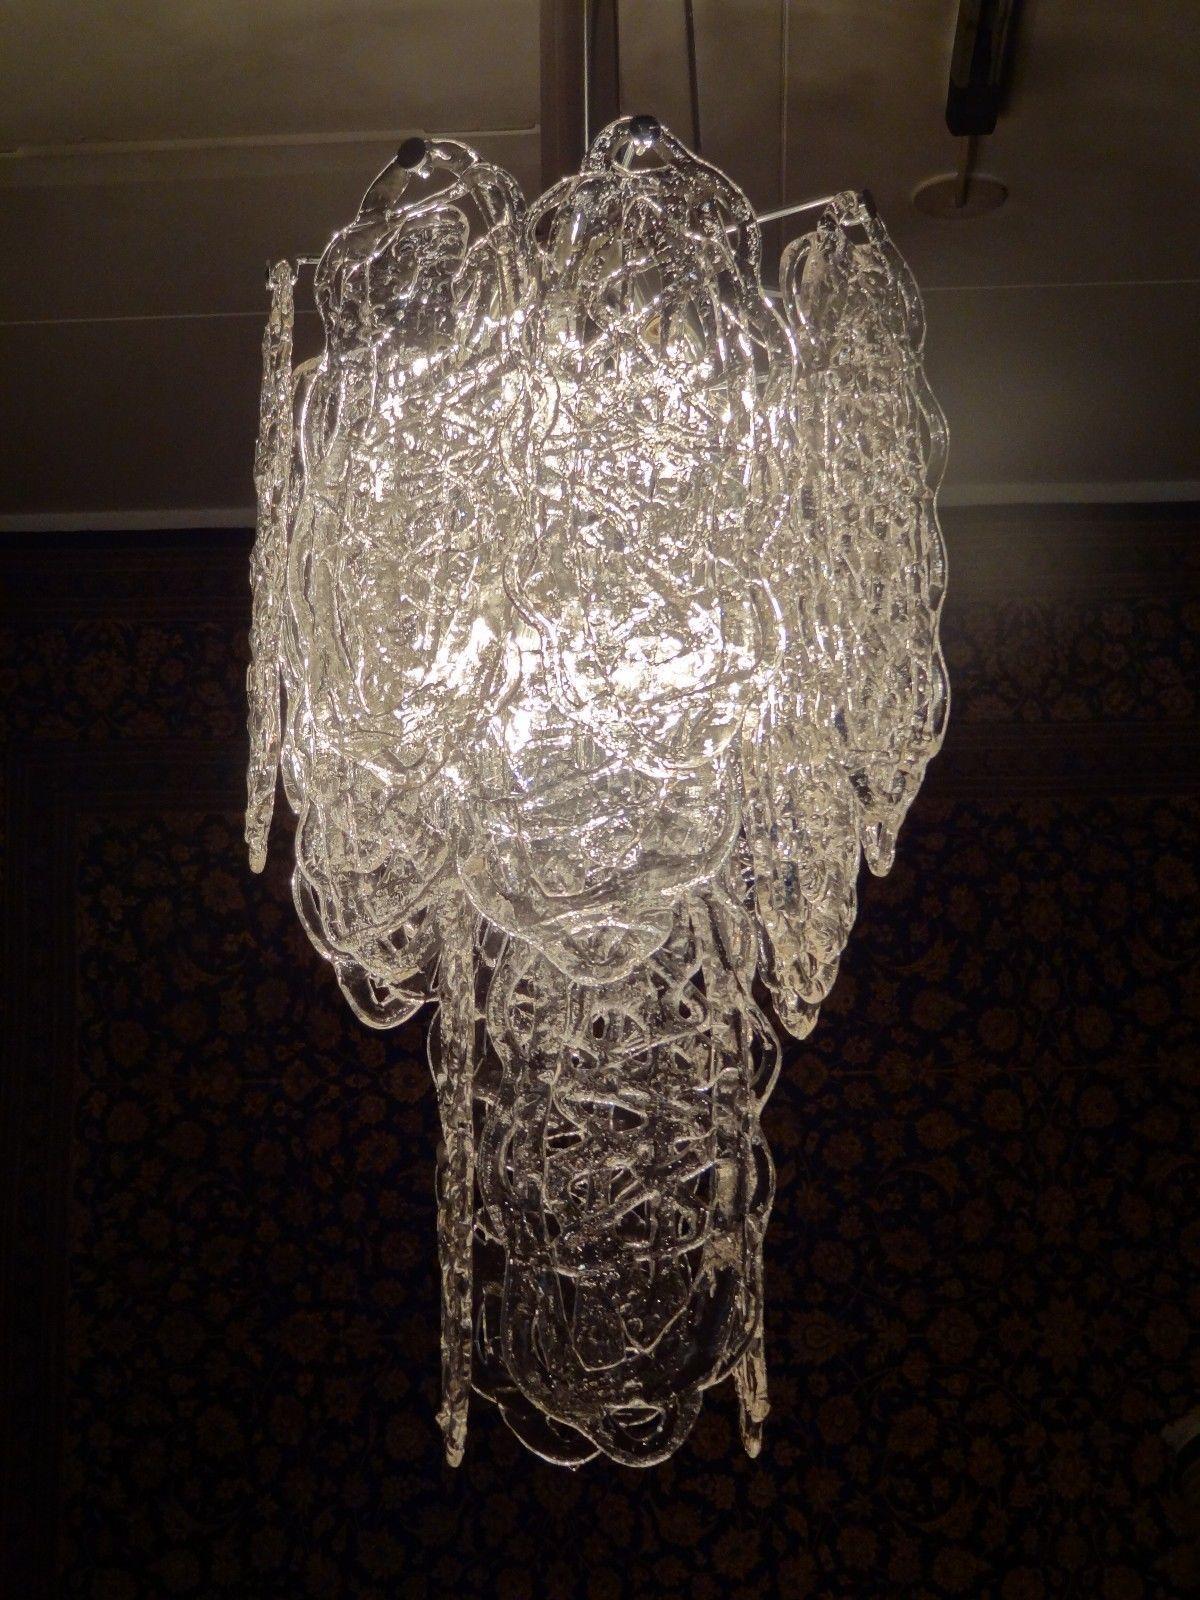 Details About Mazzega Murano Glass Vintage Chandelier Ceiling